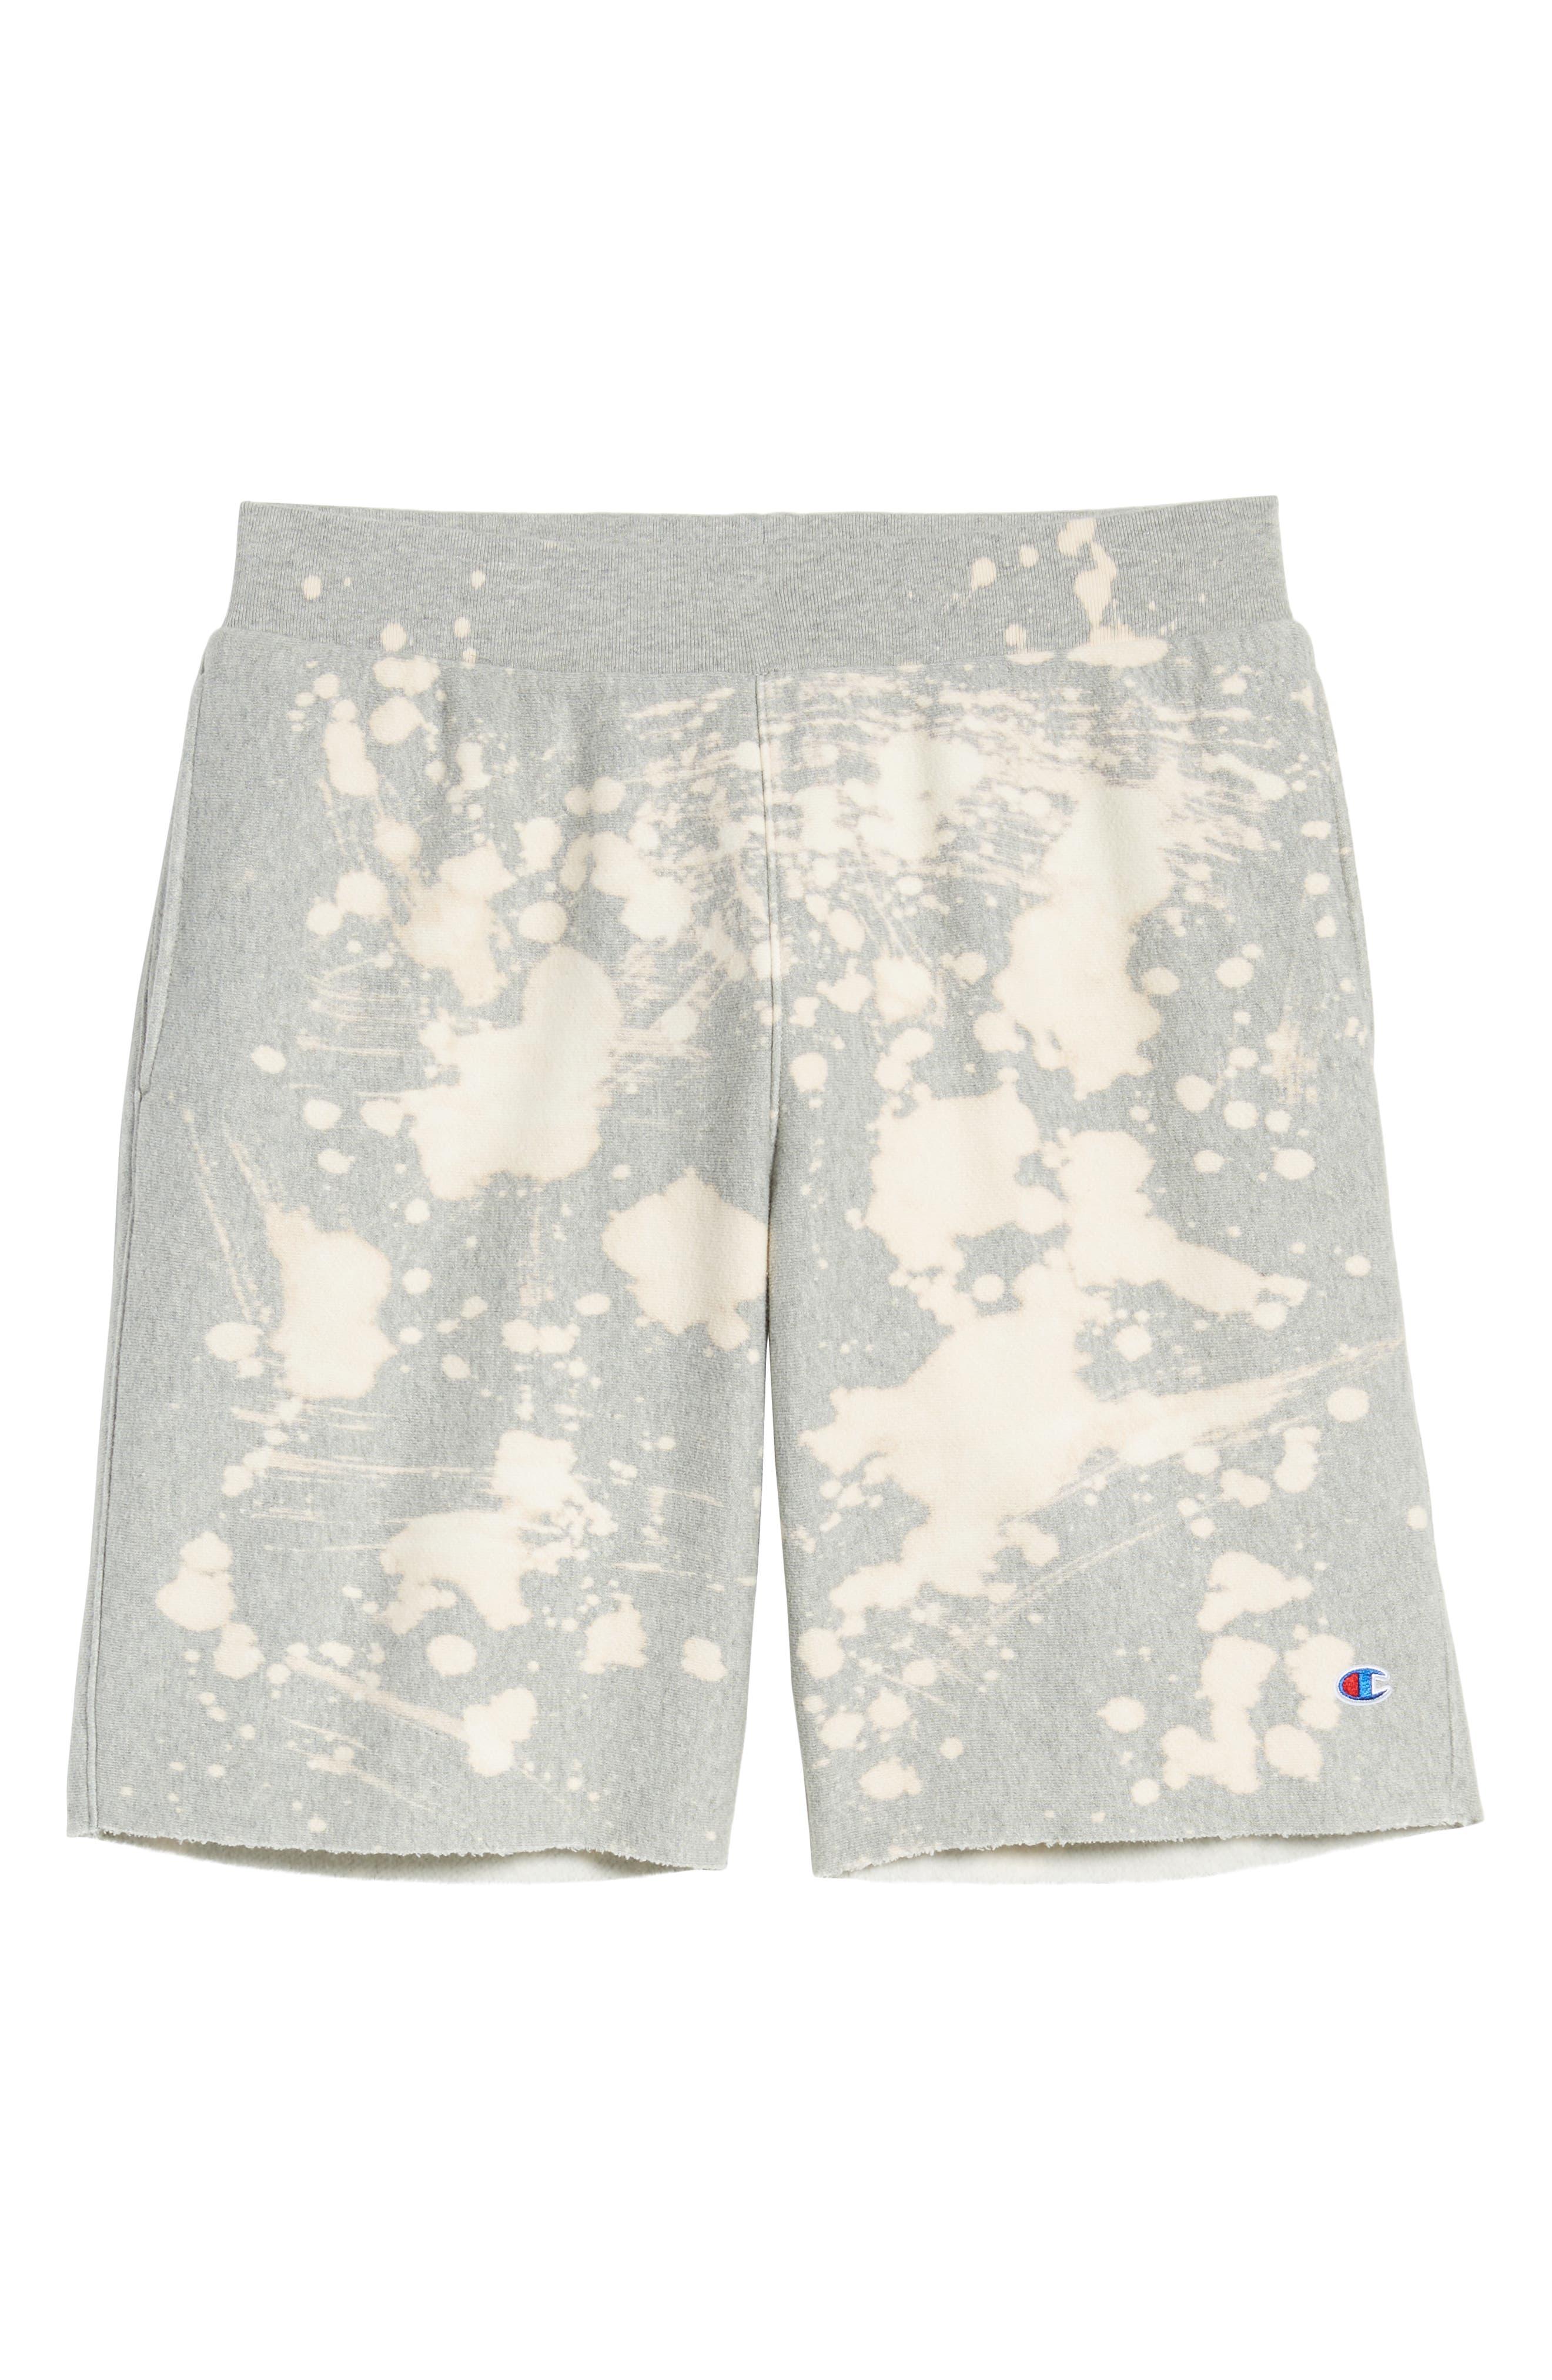 CHAMPION, Bleach Splatter Crewneck Athletic Shorts, Alternate thumbnail 7, color, OXFORD GREY